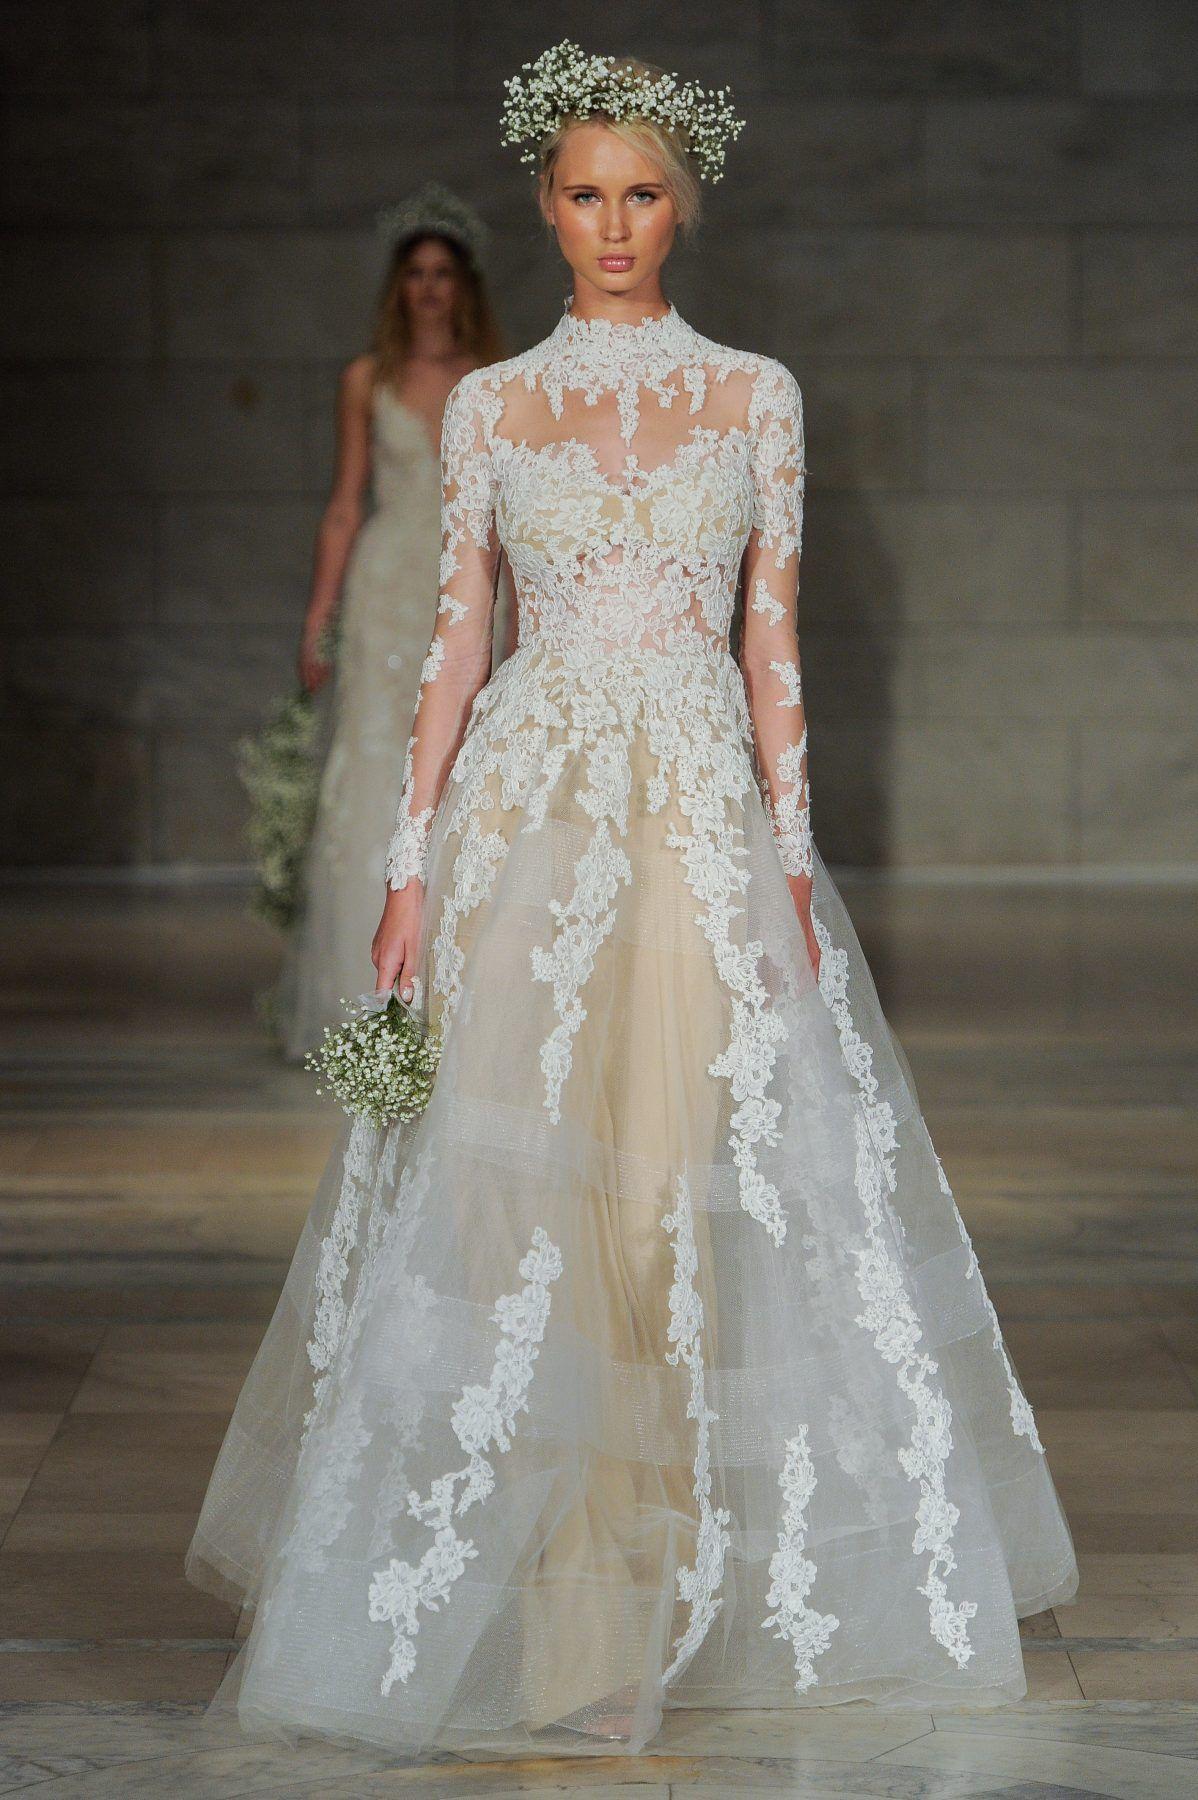 High Neck Long Sleeve Lace Illusion A Line Wedding Dress Reem Acra Style Adoren Reem Acra Wedding Dress High Neck Wedding Dress Wedding Dress Long Sleeve